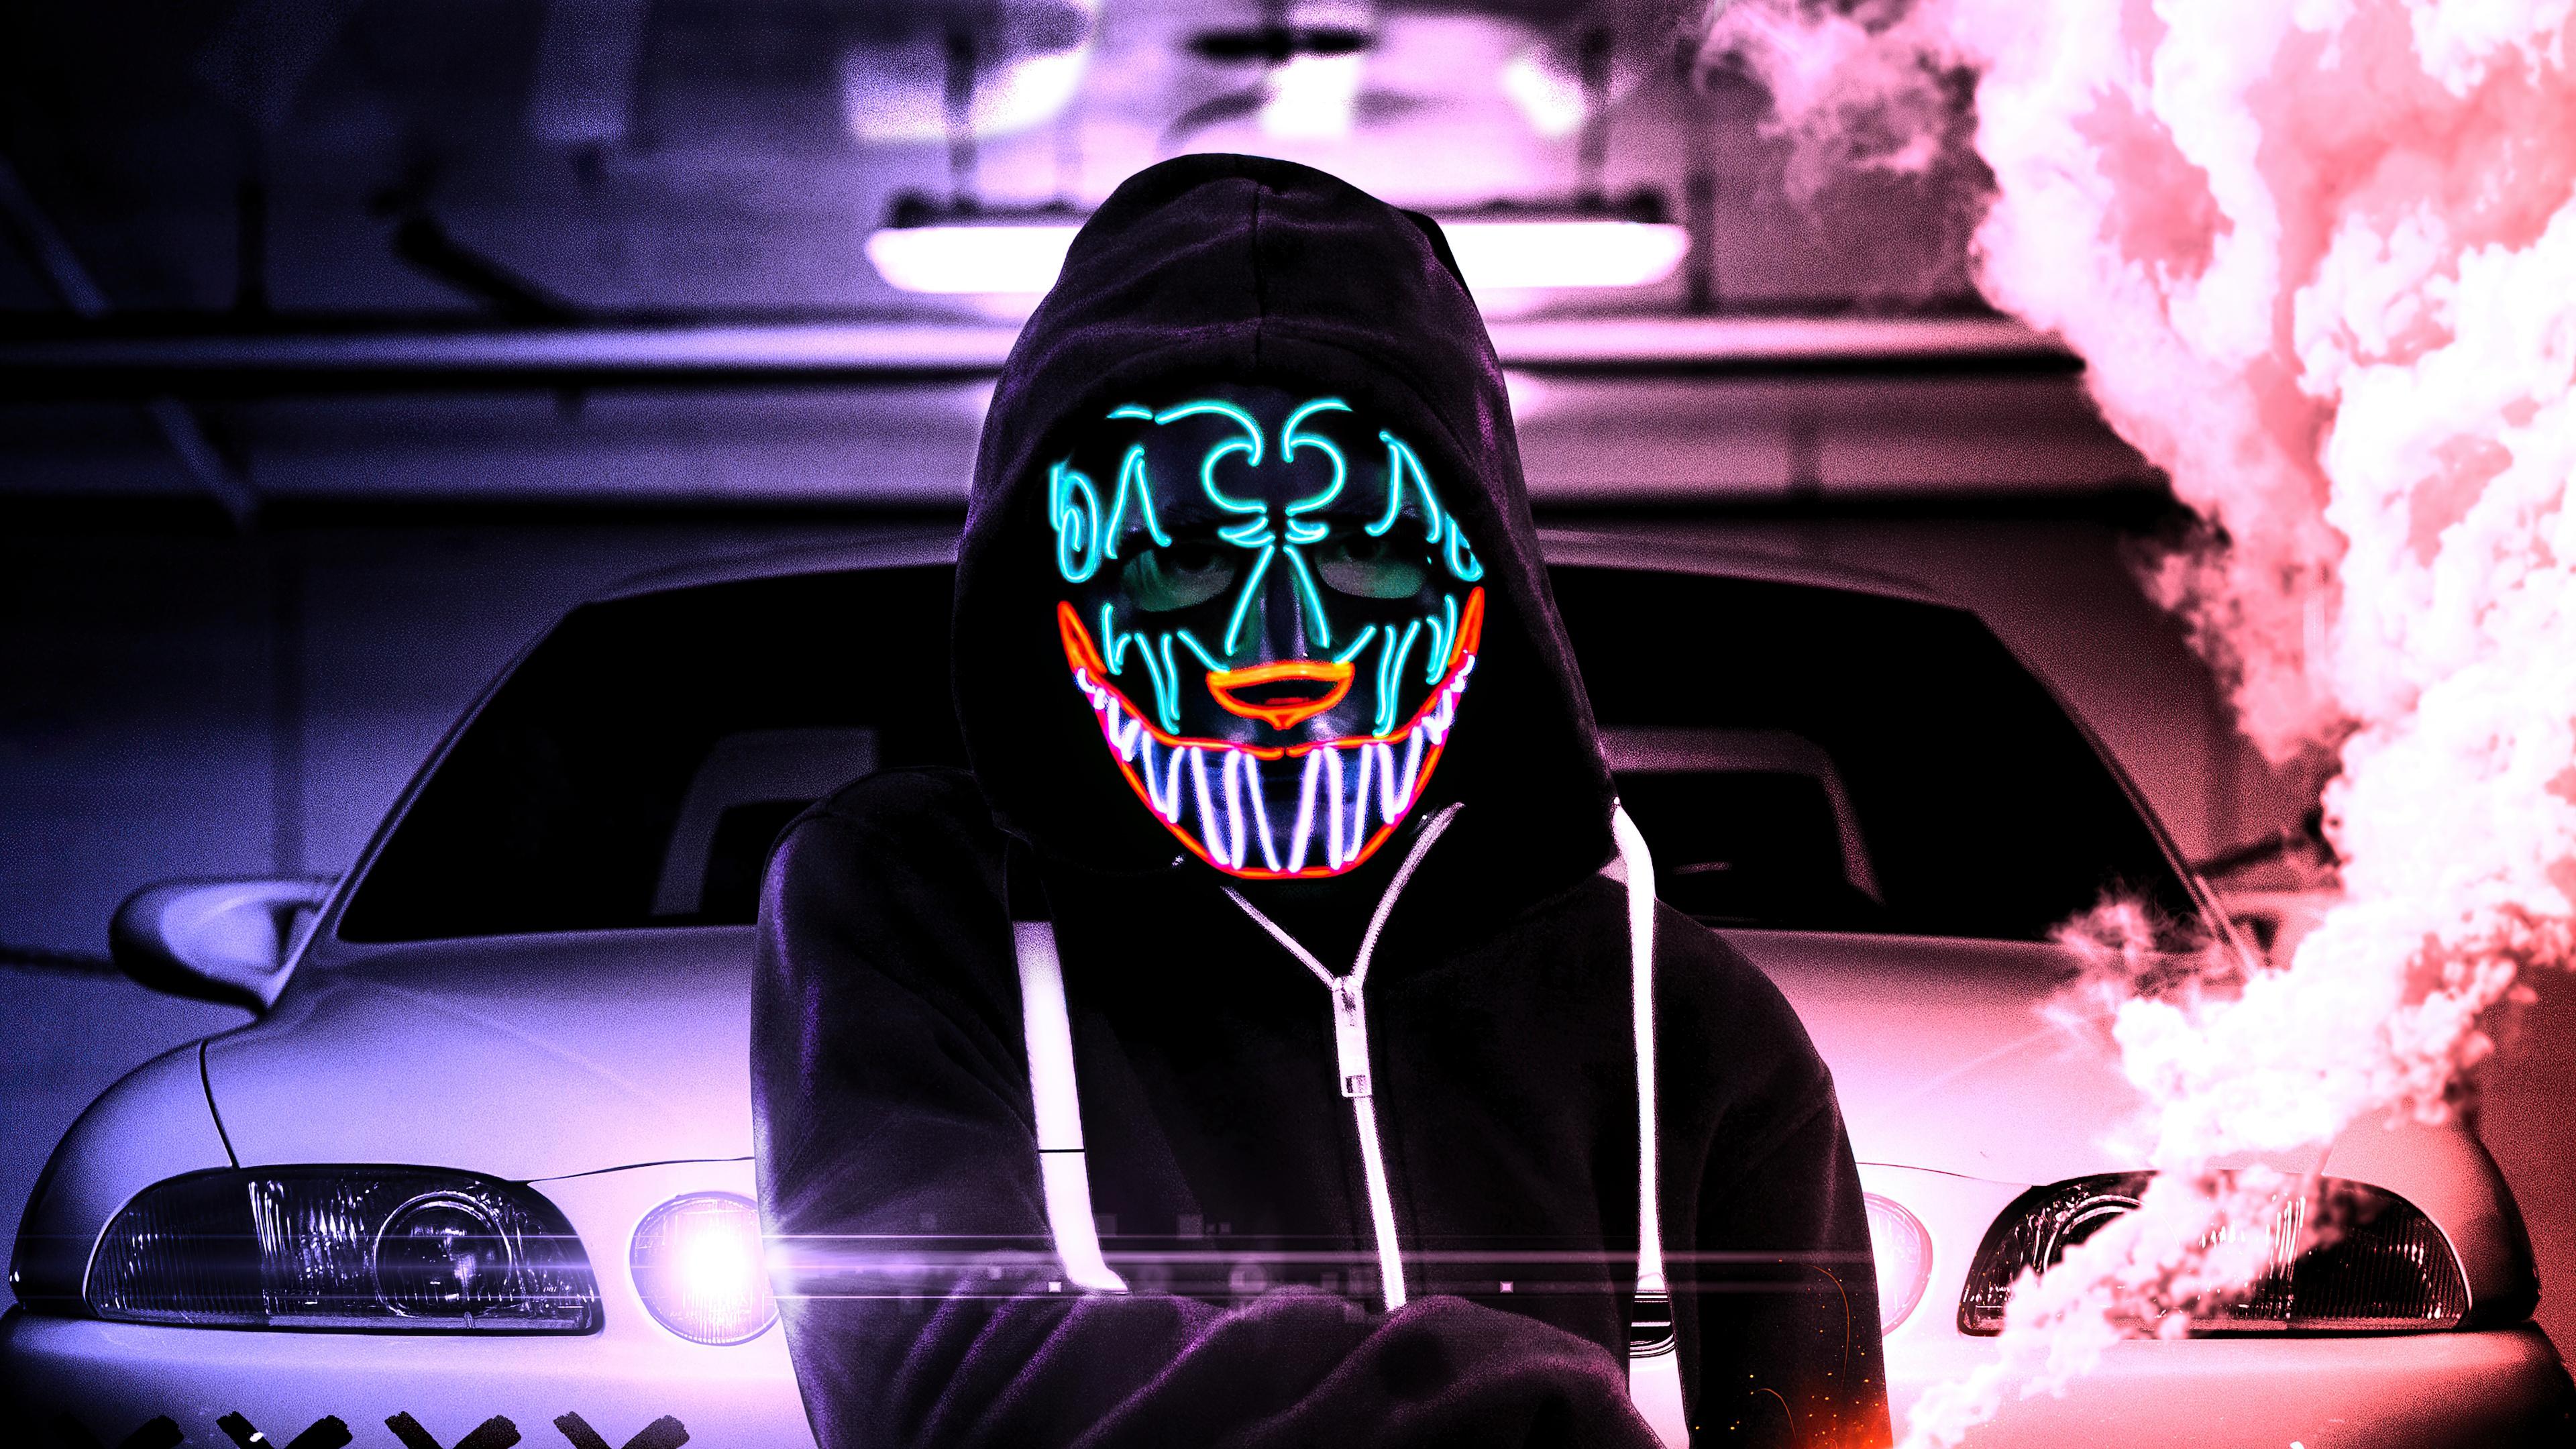 glowing mask pattern 4k 1616093169 - Glowing Mask Pattern 4k - Glowing Mask Pattern 4k wallpapers